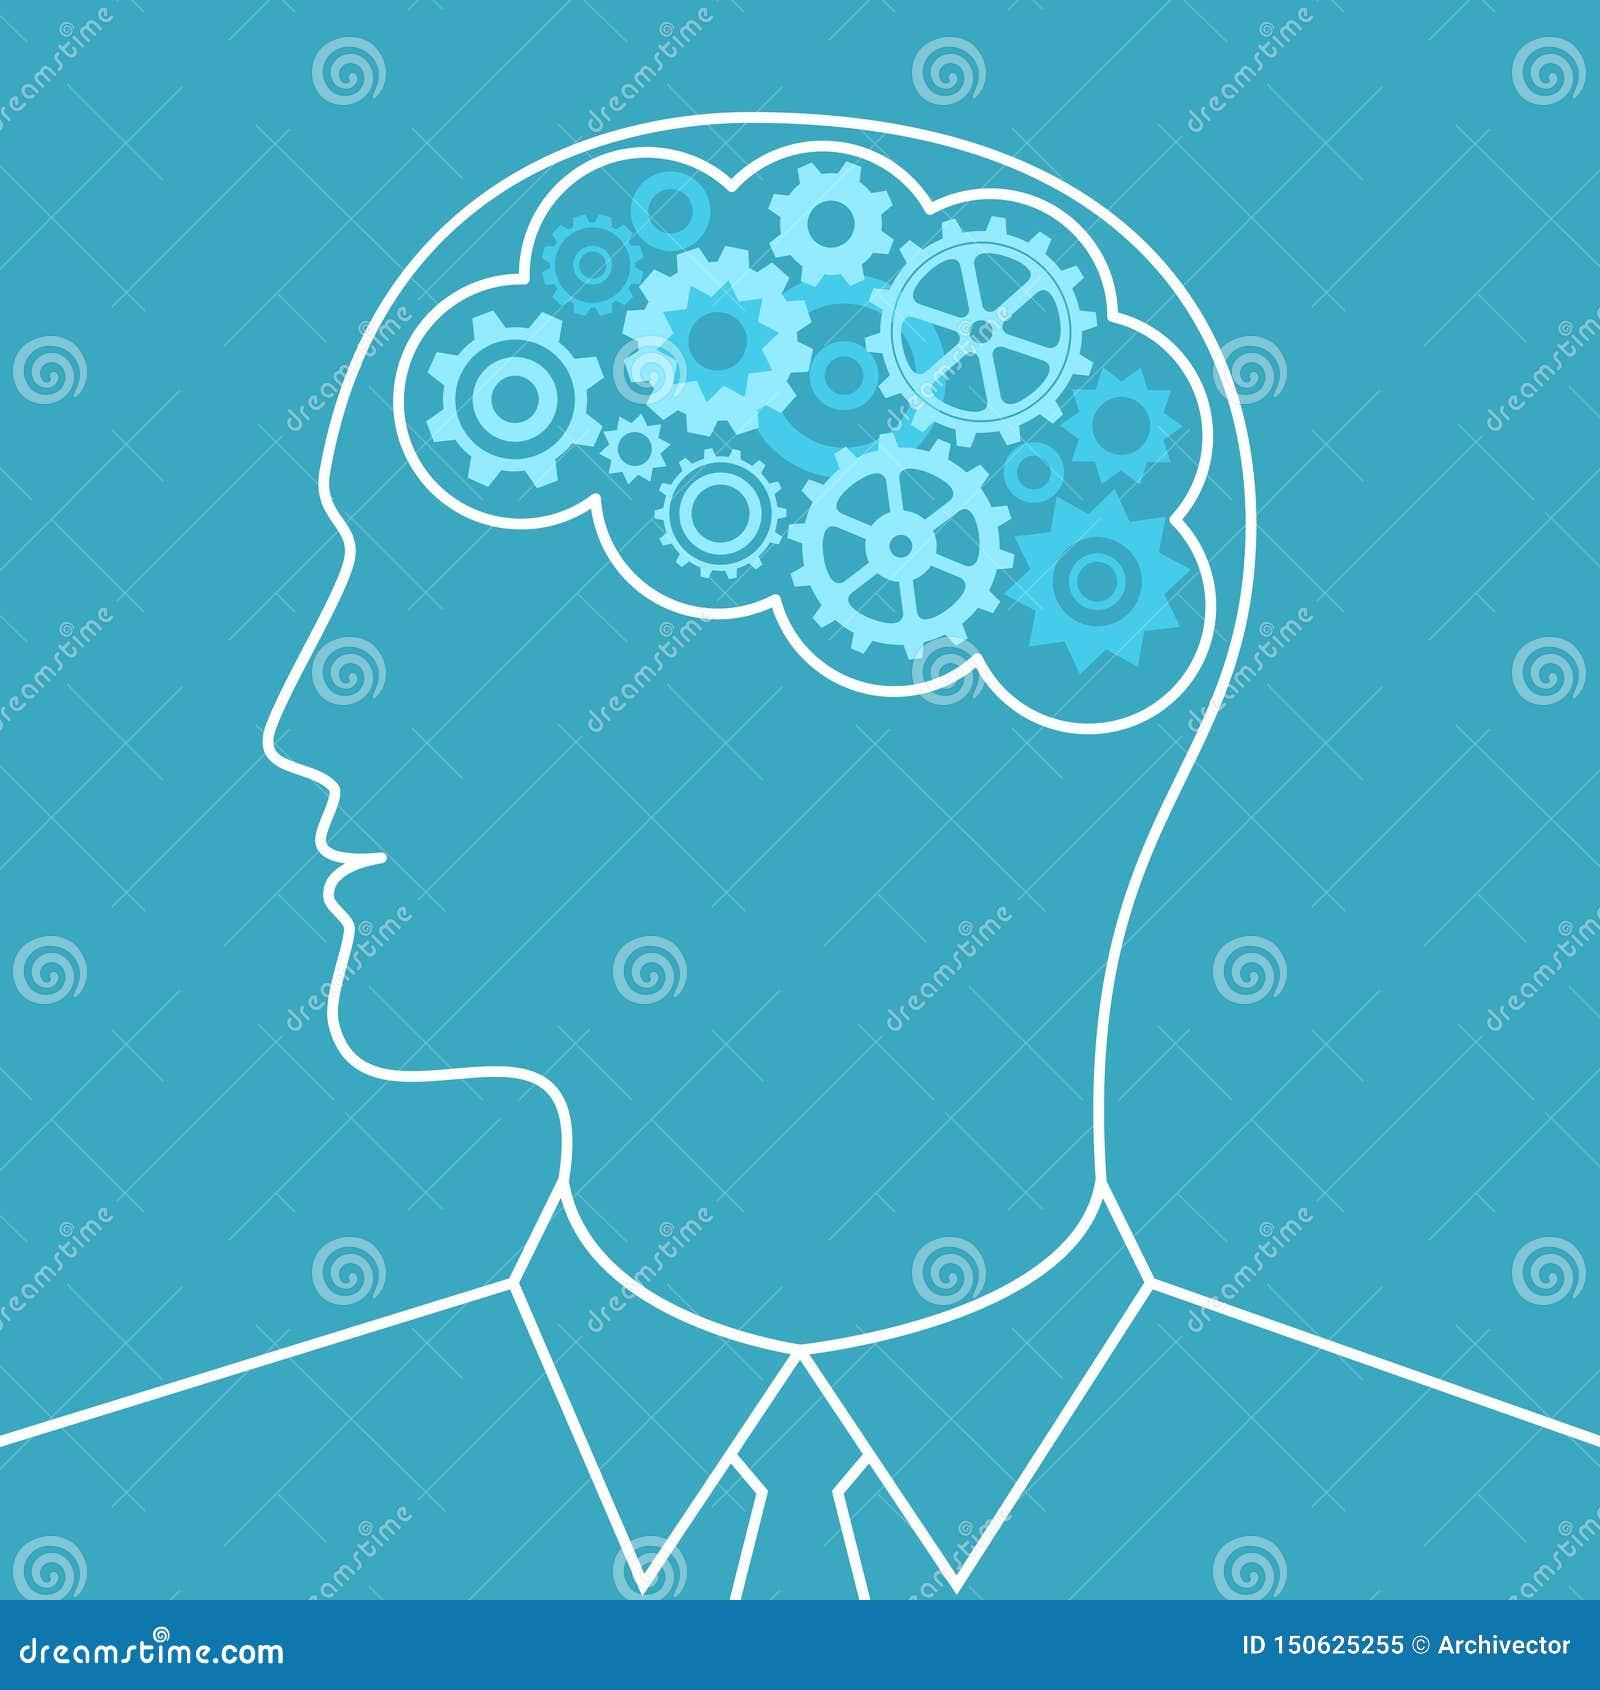 Gears in brain man. Business concept